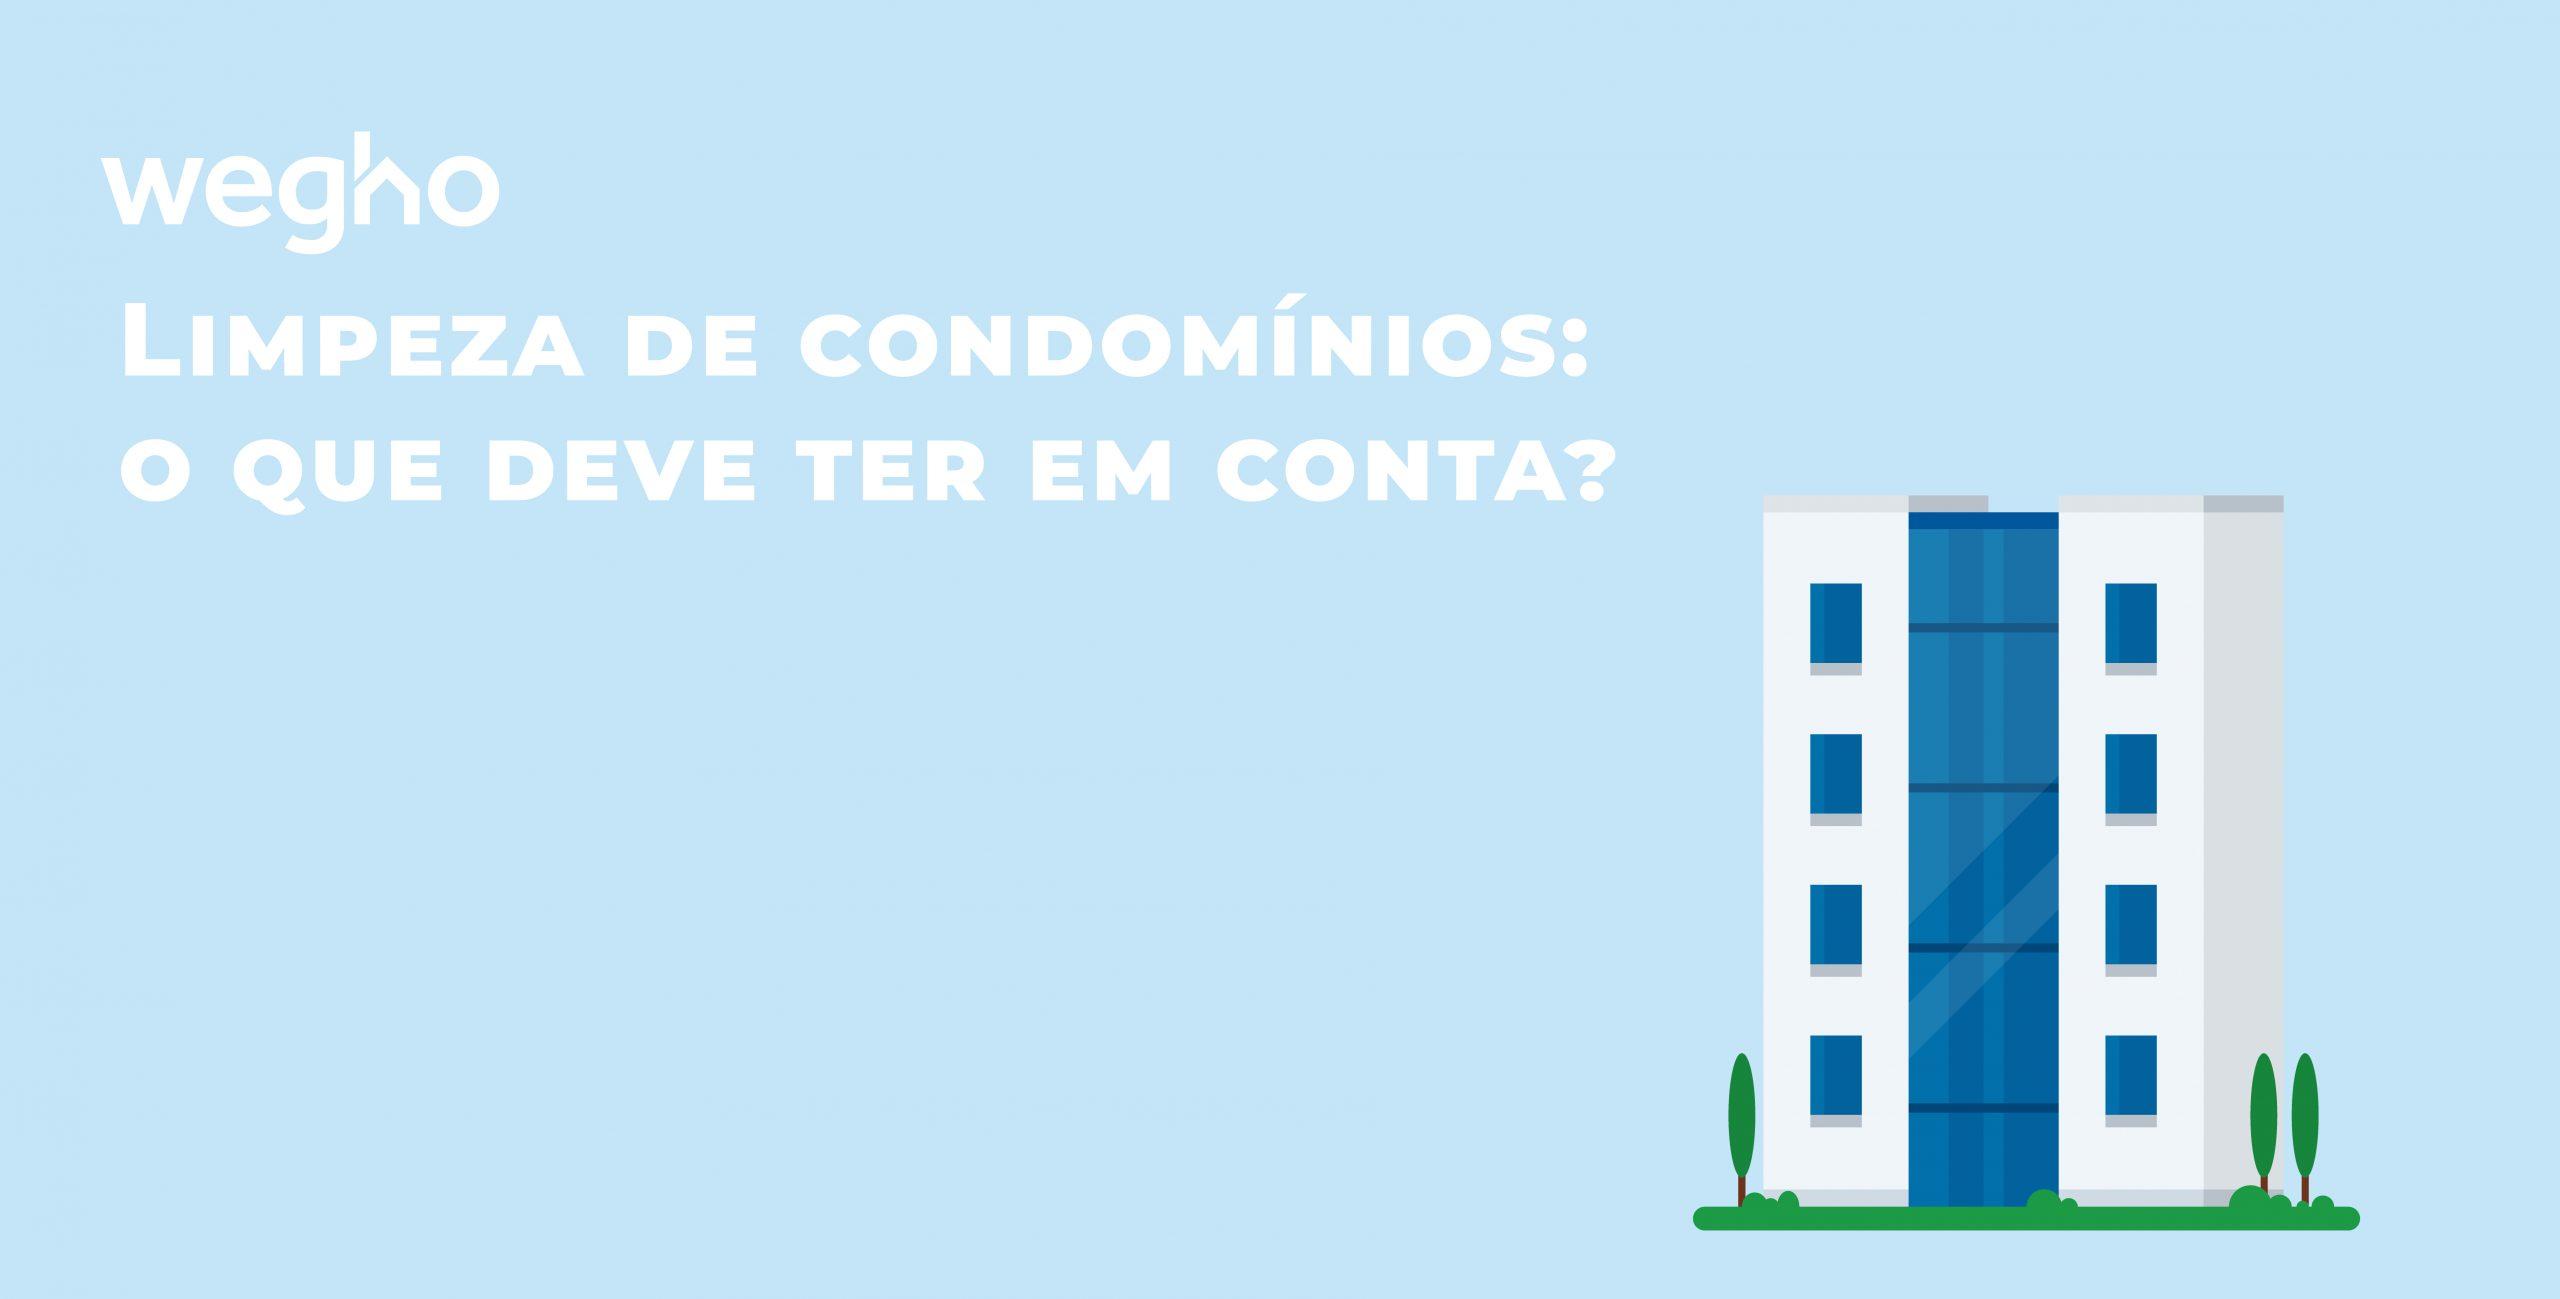 Limpeza de condomínios: o que deve ter em conta?